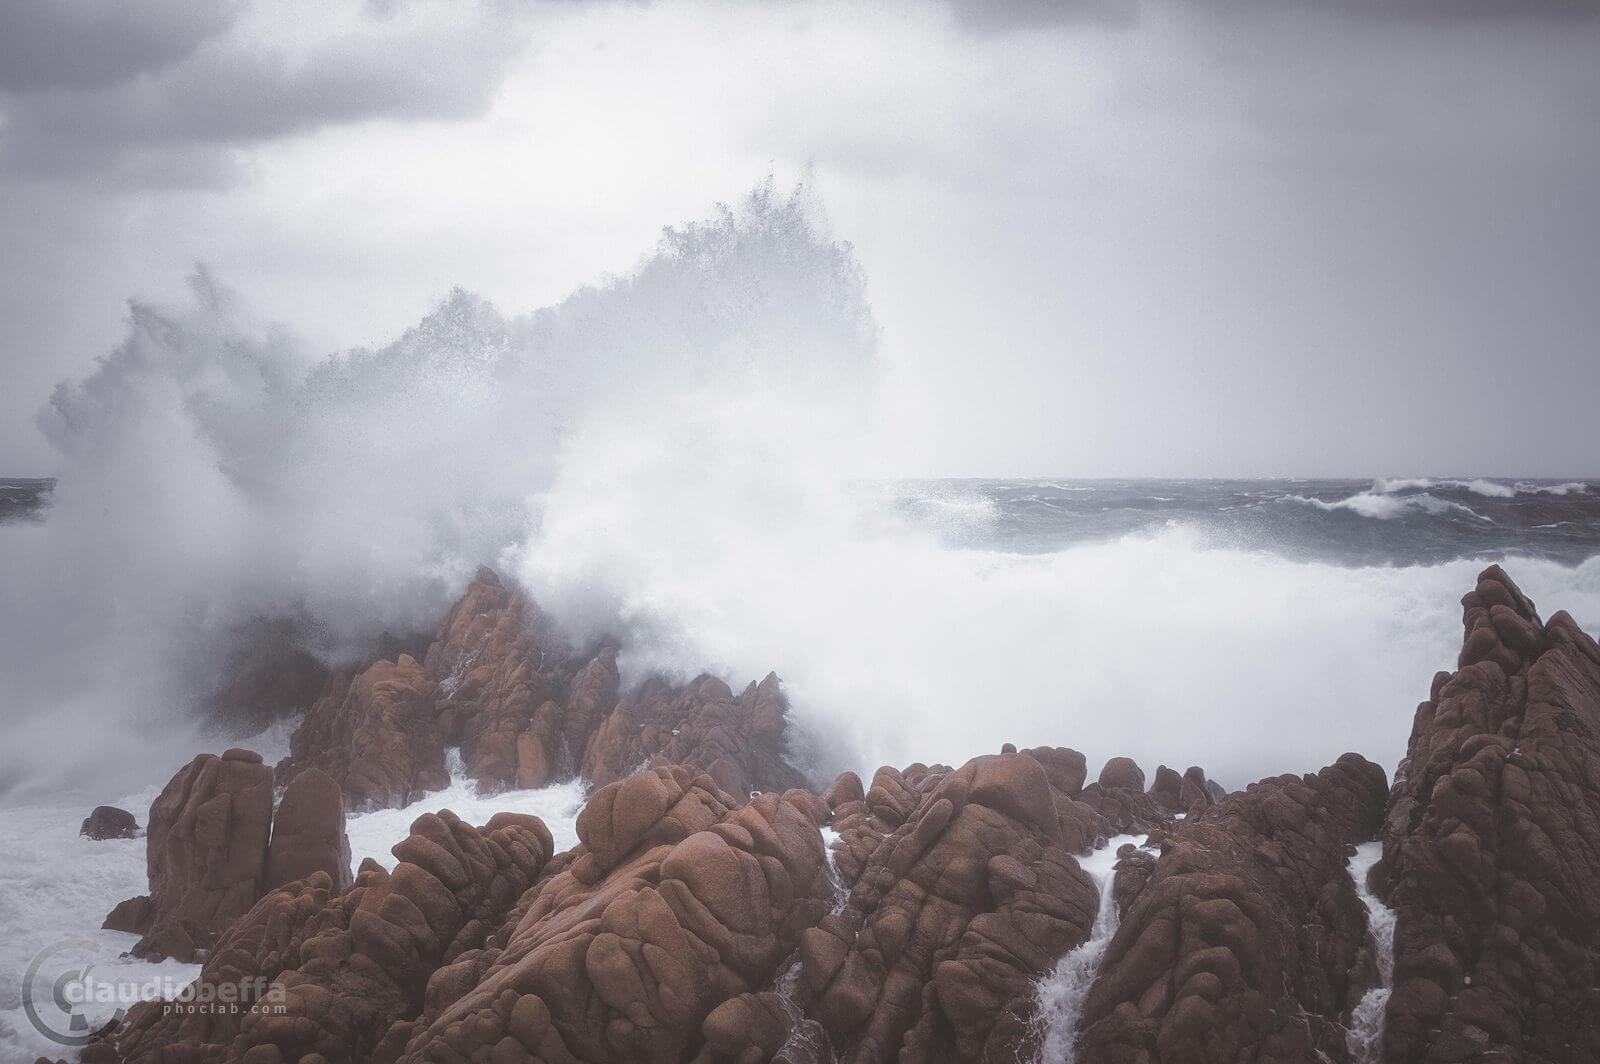 Sardinia, Sardegna, Italy, Sea, Storm, Waves, Rocks, Nature, Landscape, Seascape, Impact III